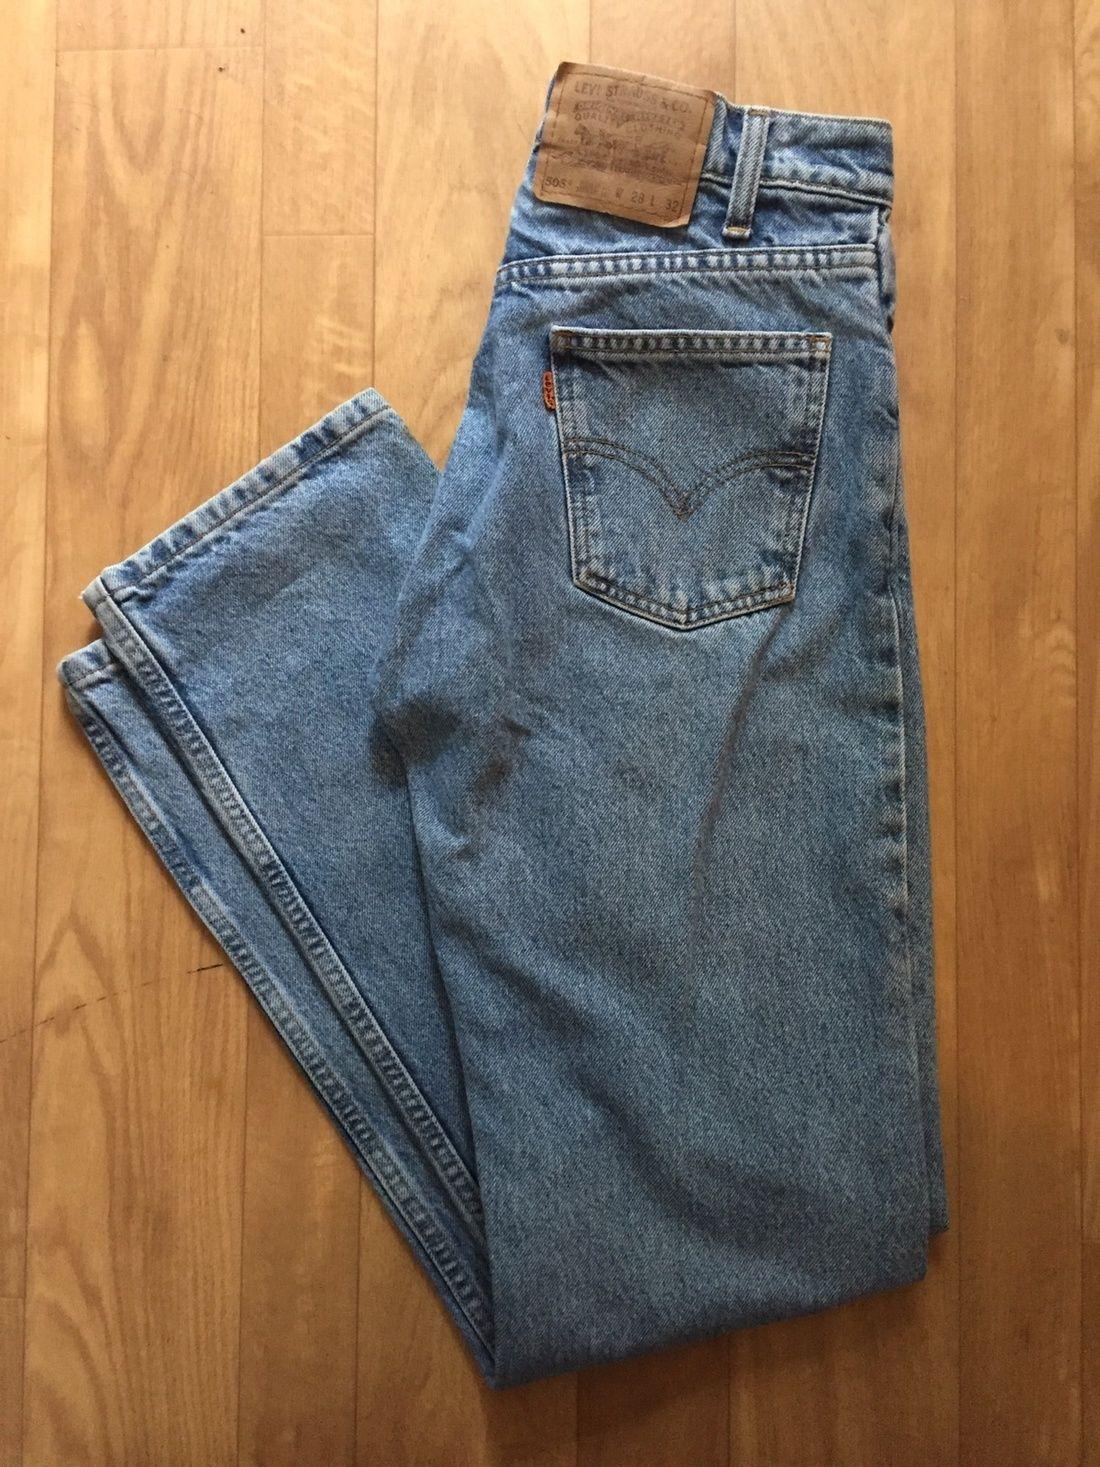 Levi S Rare Vintage Levi 505 Orange Tab Jeans Size 28 43 Vintage Levis 505 Vintage Levis Levis Vintage Clothing